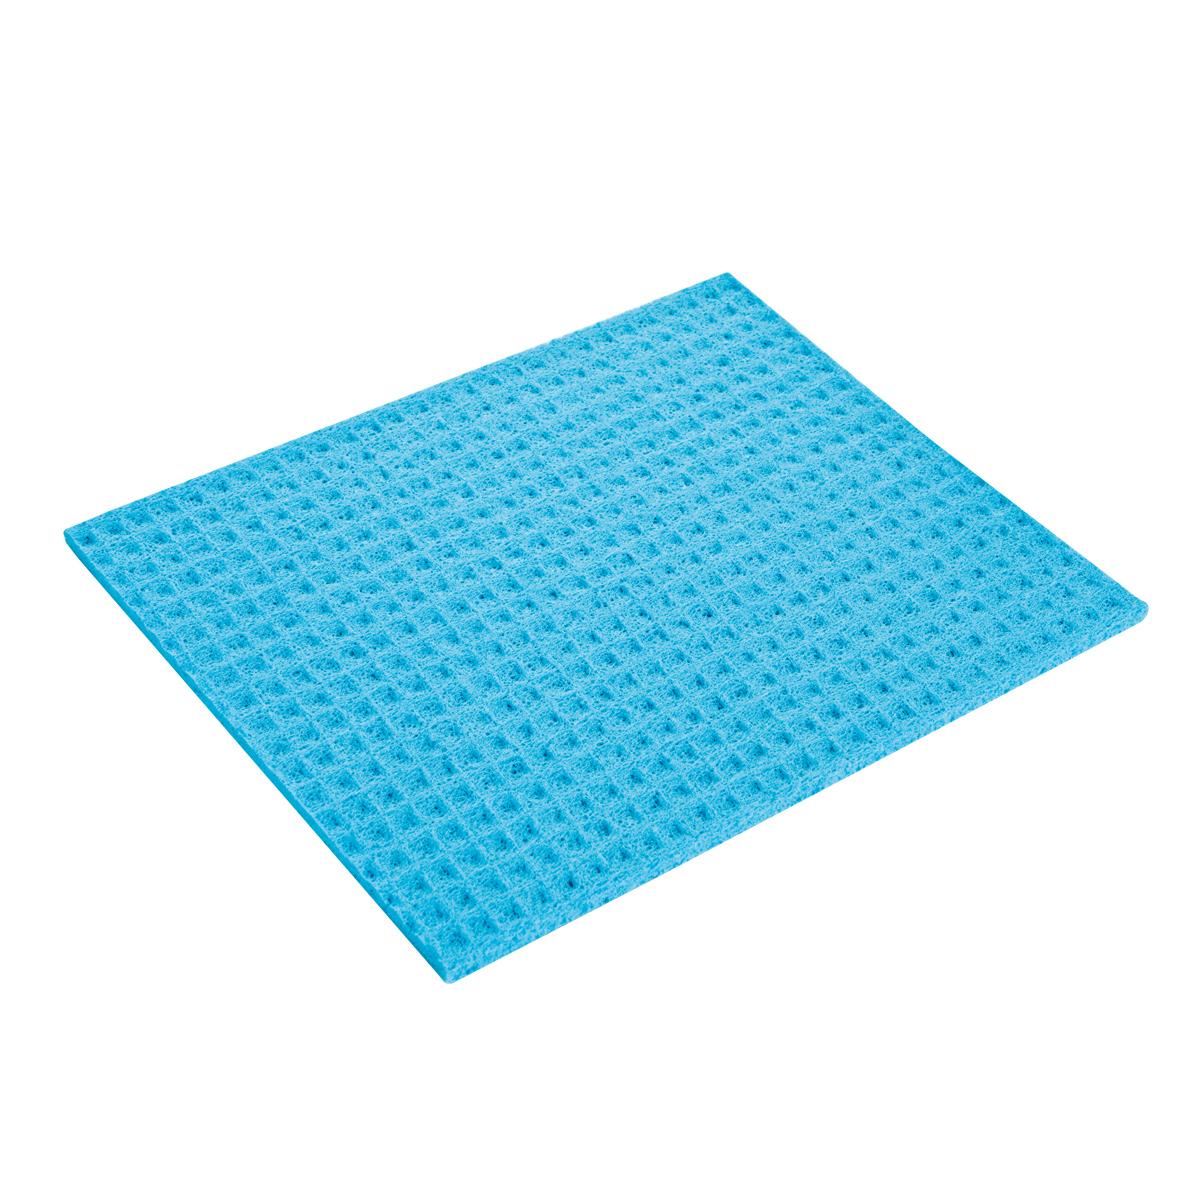 Houbové utěrky CLEAN KIT 18x15 cm, 4 ks